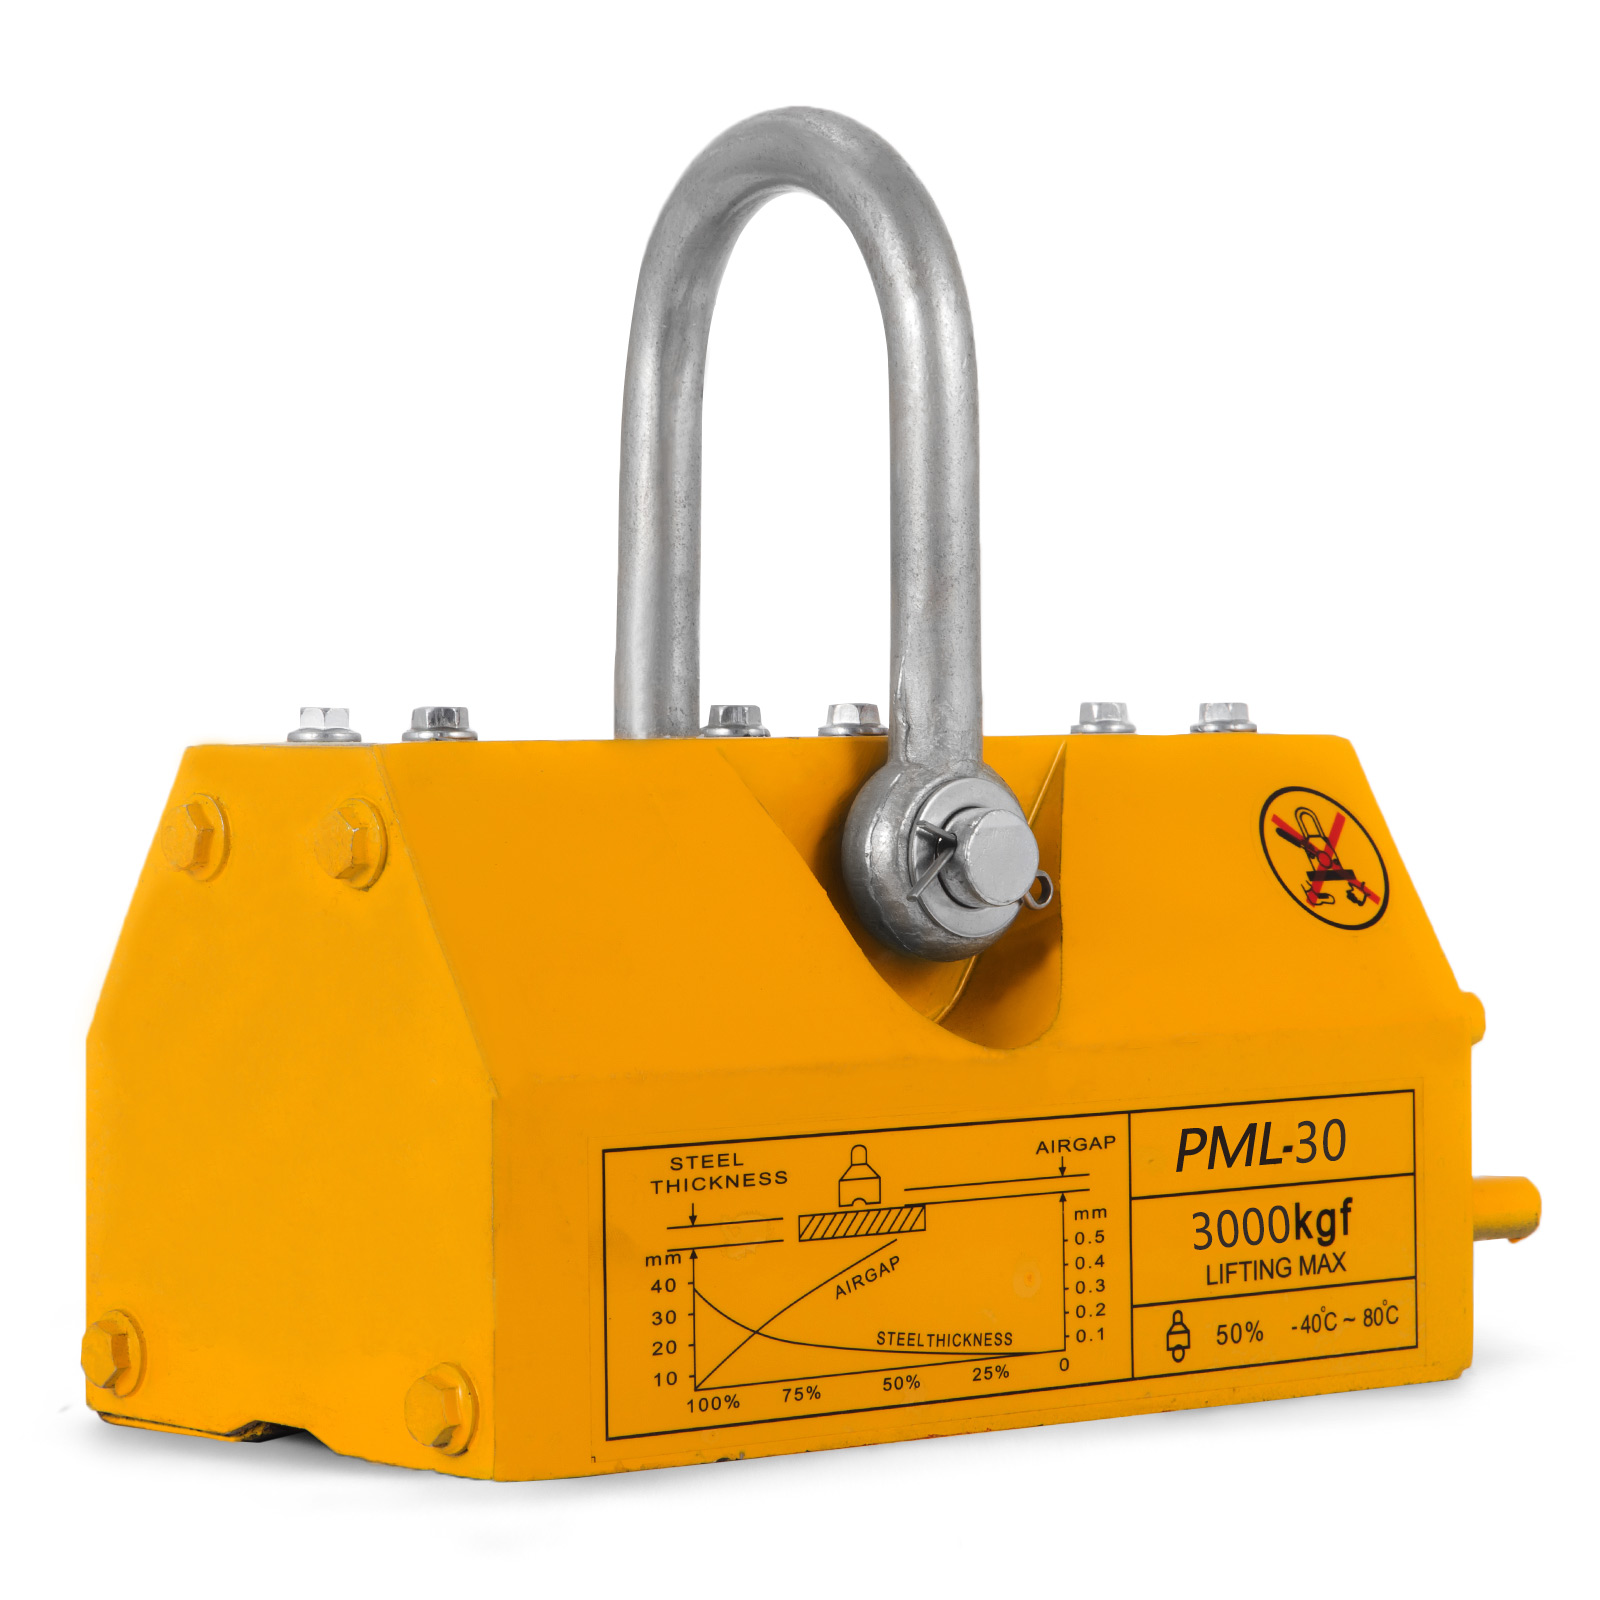 100-300-600-1000KG-Steel-Magnetic-Lifter-Heavy-Duty-Crane-Hoist-Lifting-Magnet miniature 102